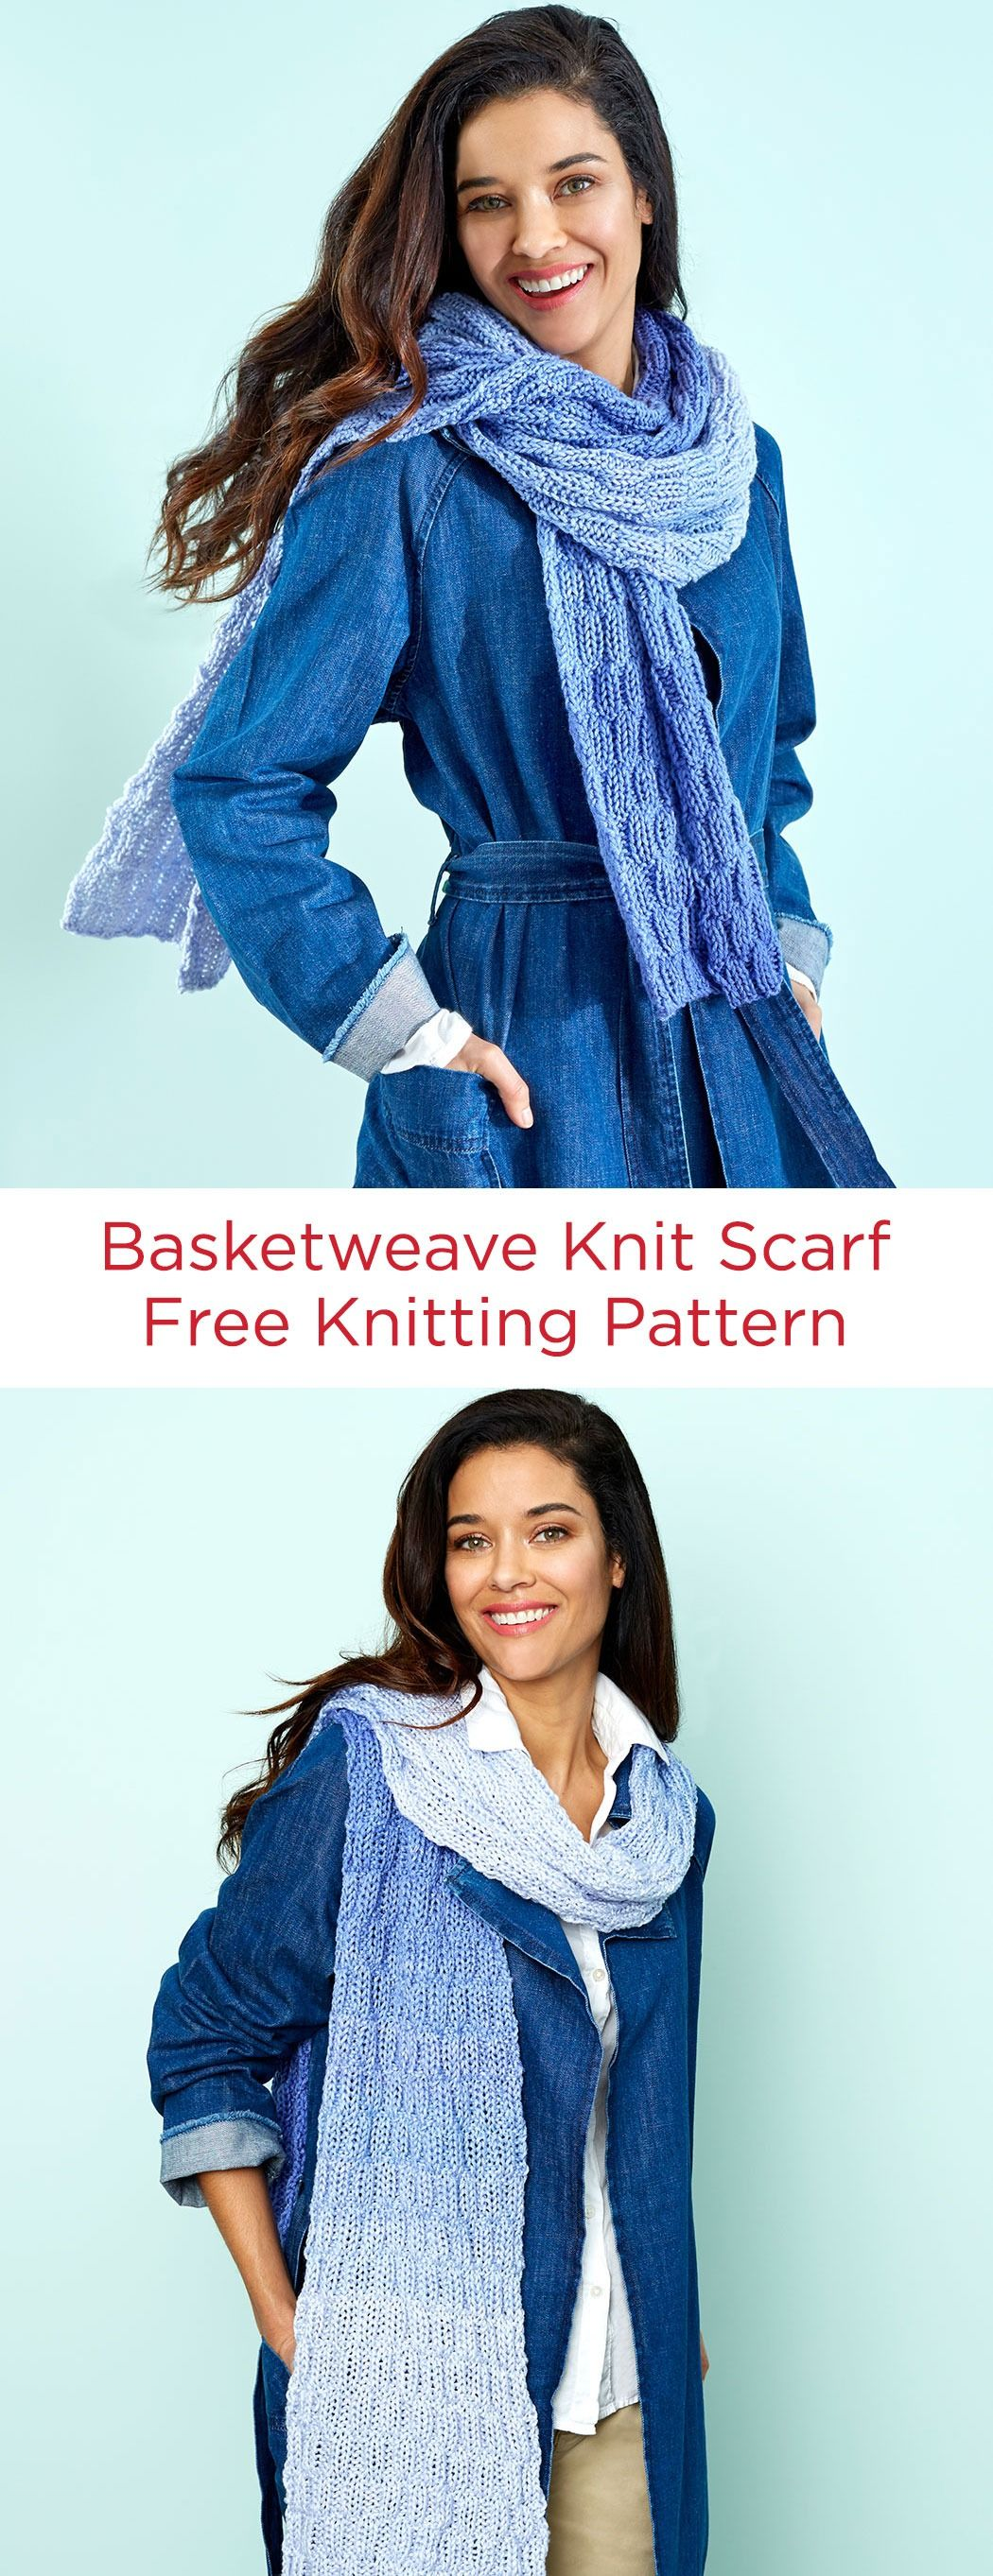 Basketweave Knit Scarf Free Knitting Pattern in Red Heart ...